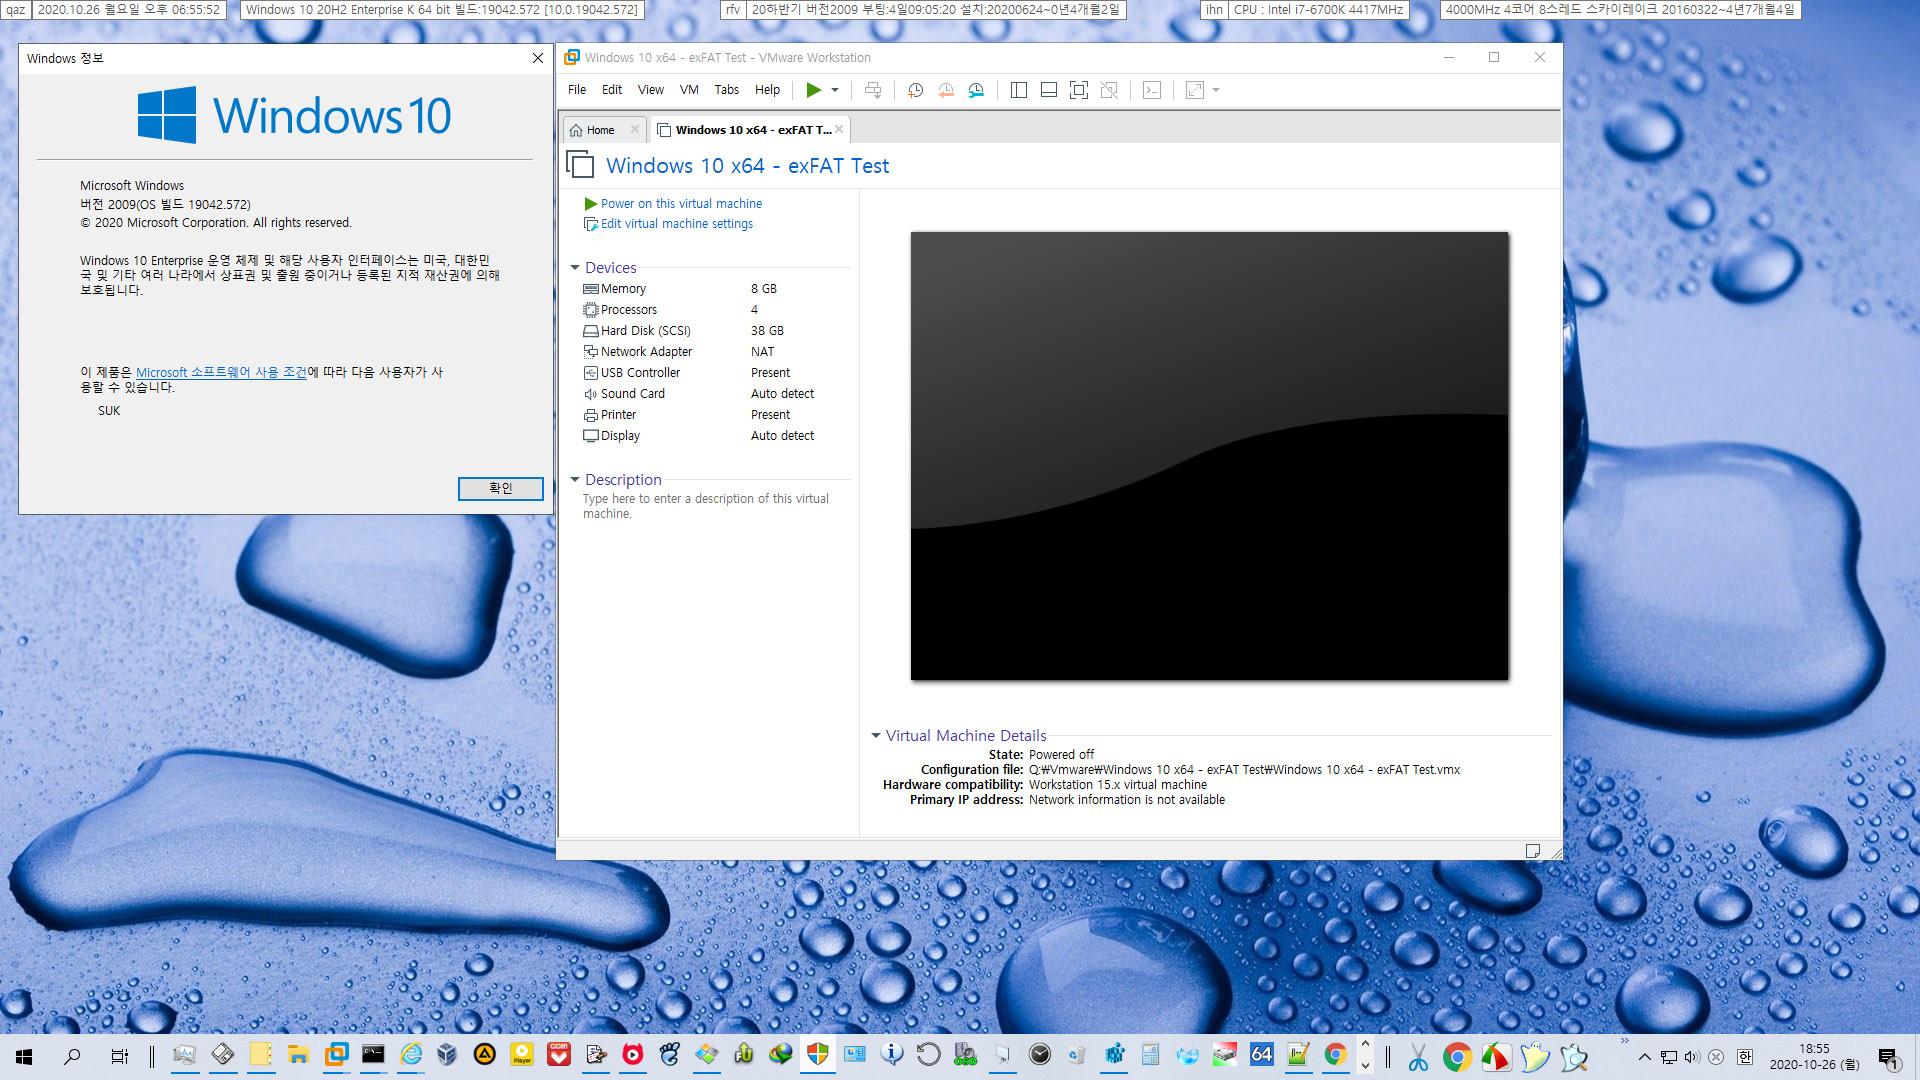 exFAT 포맷으로도 VHD 부팅이 Windows 10 버전 1903부터 된다고 하여 테스트 - 완전 생고생 했습니다 2020-10-26_185552.jpg